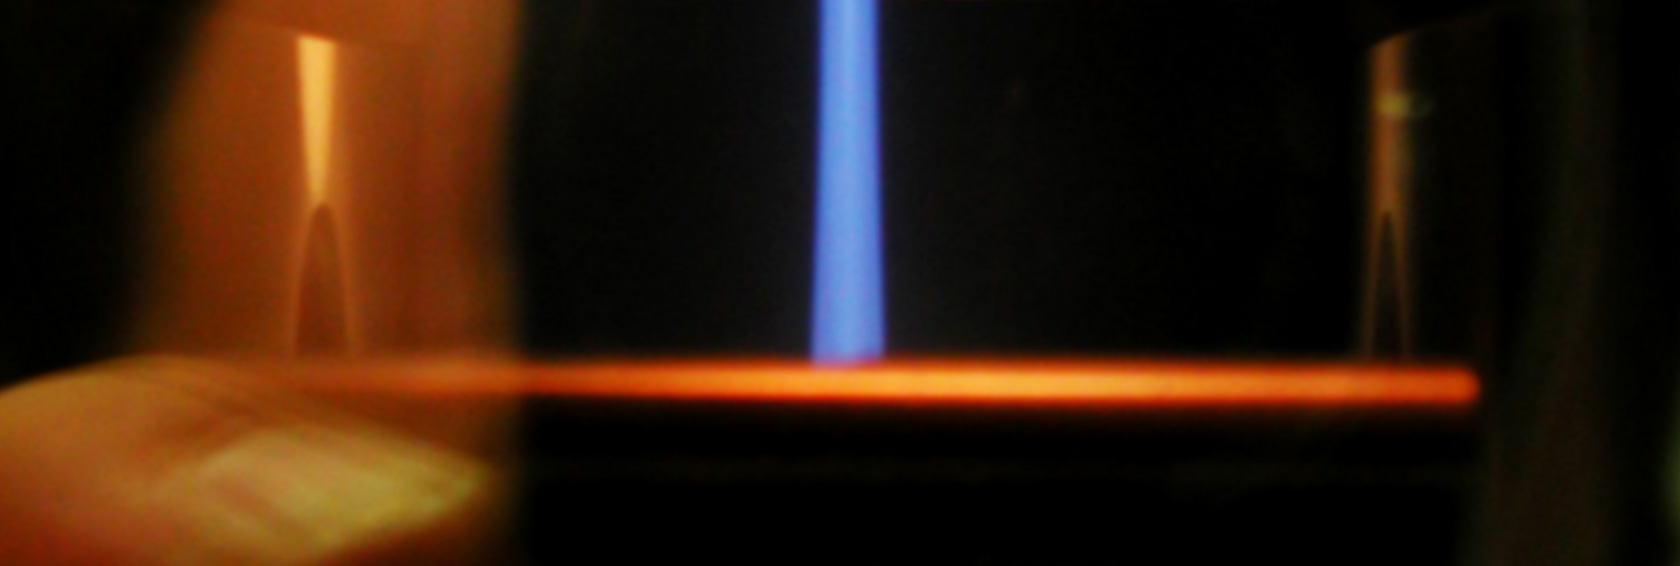 Electron Beam Melting Vfe Heat Treatment Industry